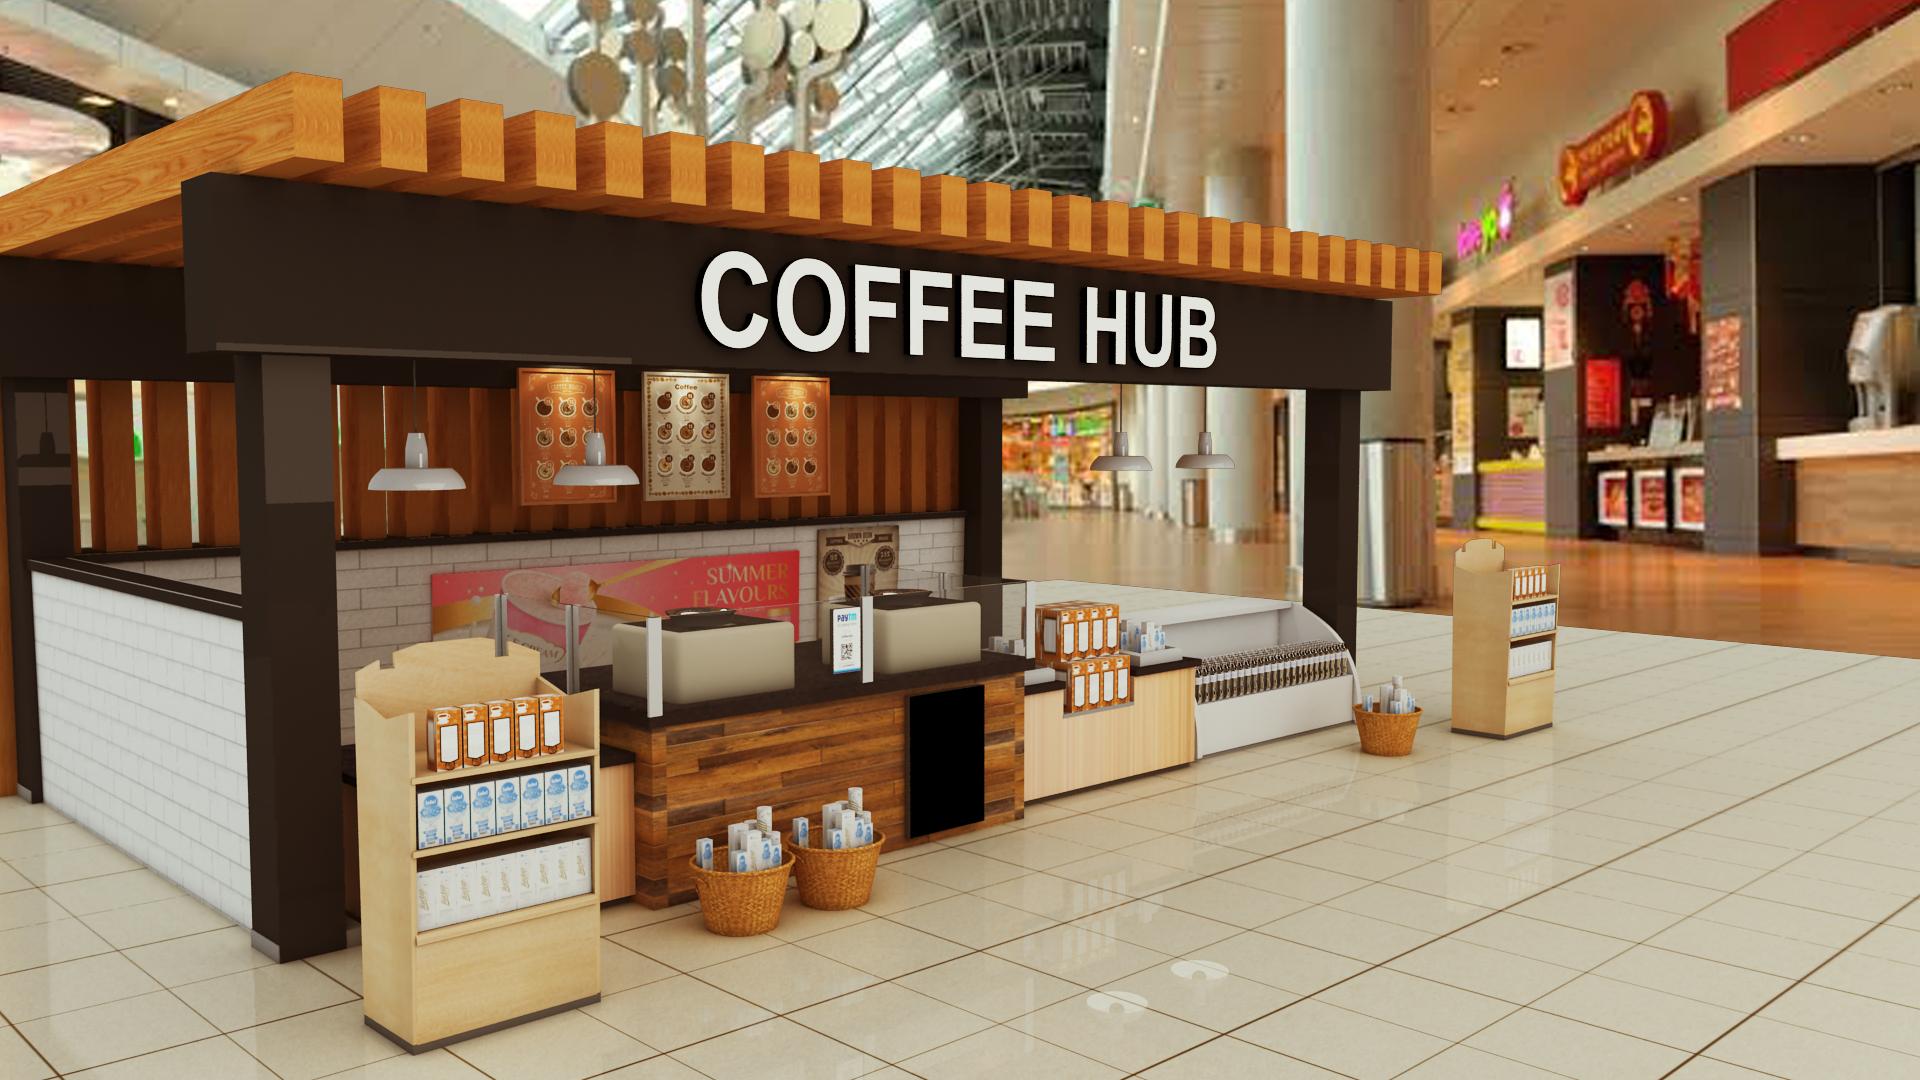 Coffee Hub Exterior Design